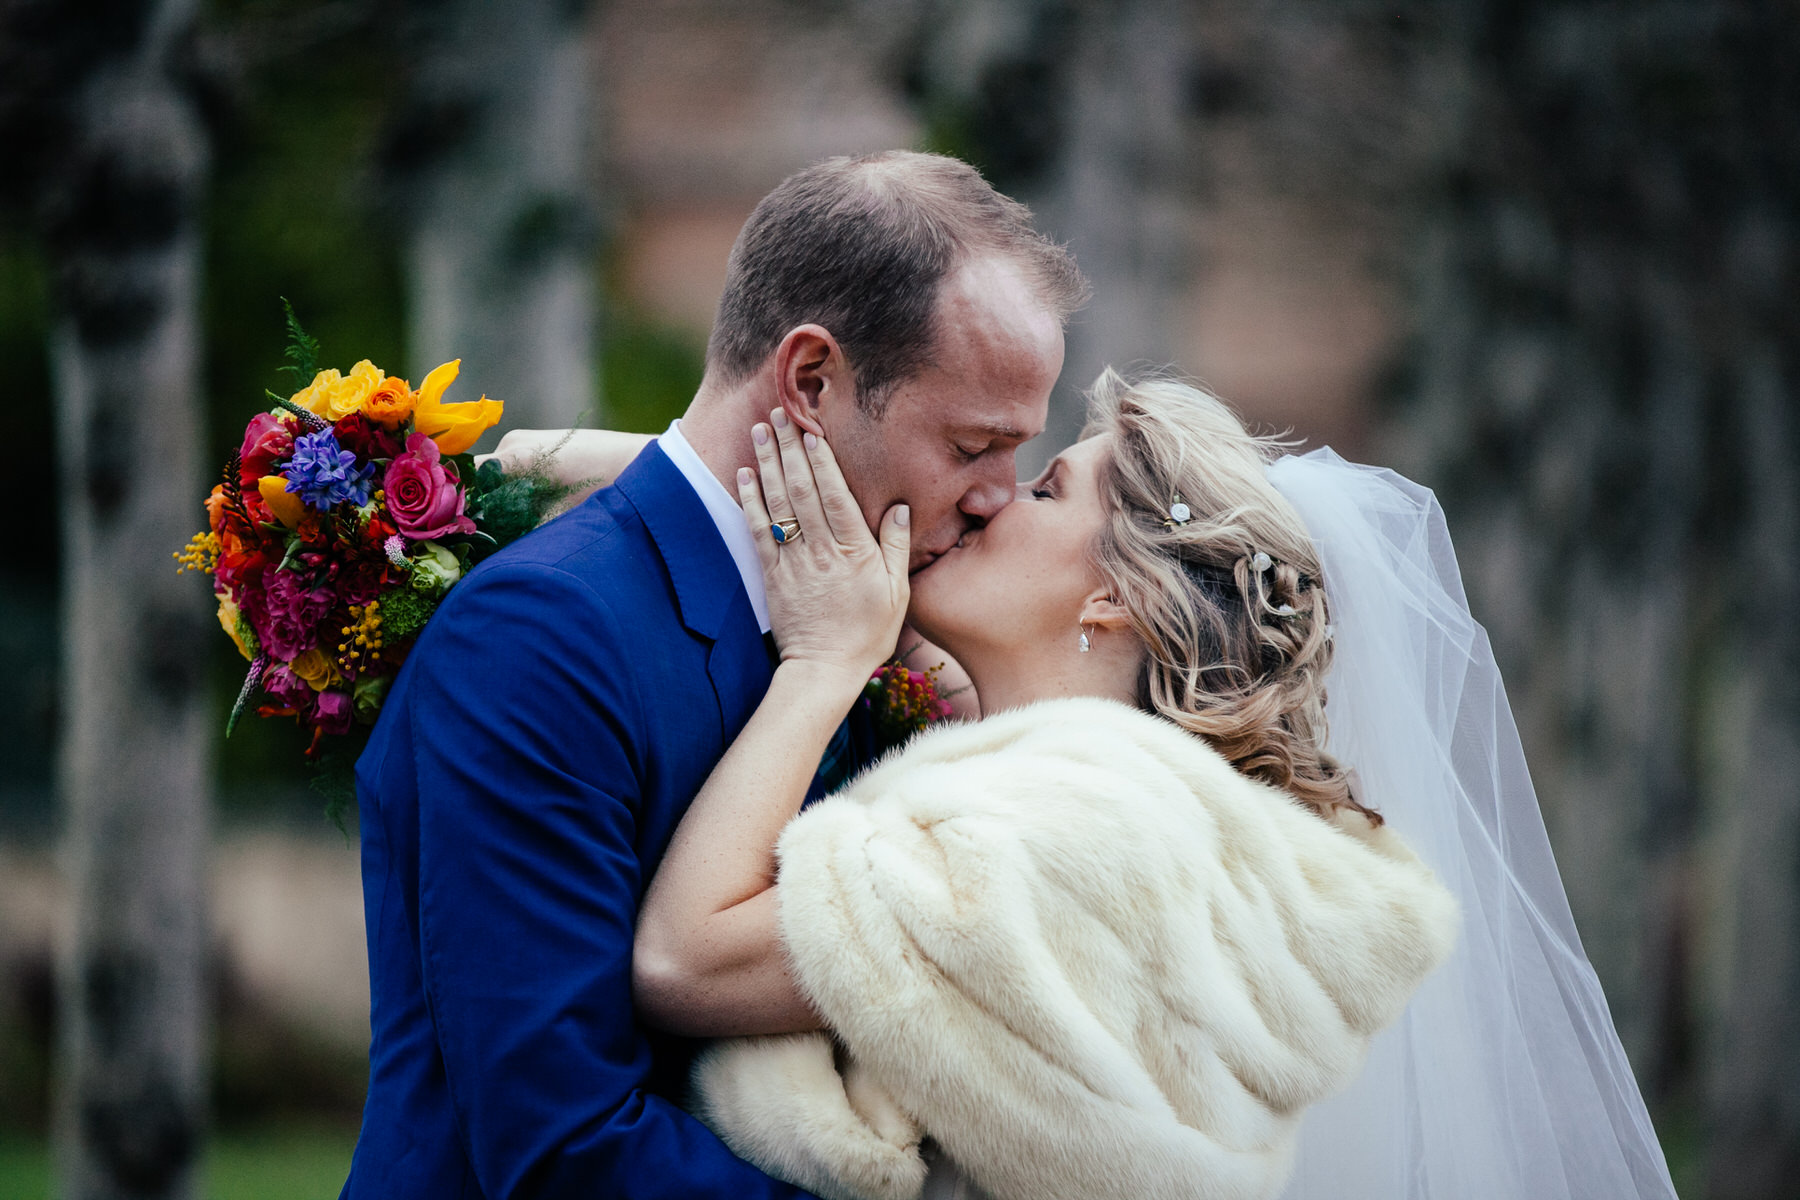 romantic natural wedding portrait bride groom kiss.jpg